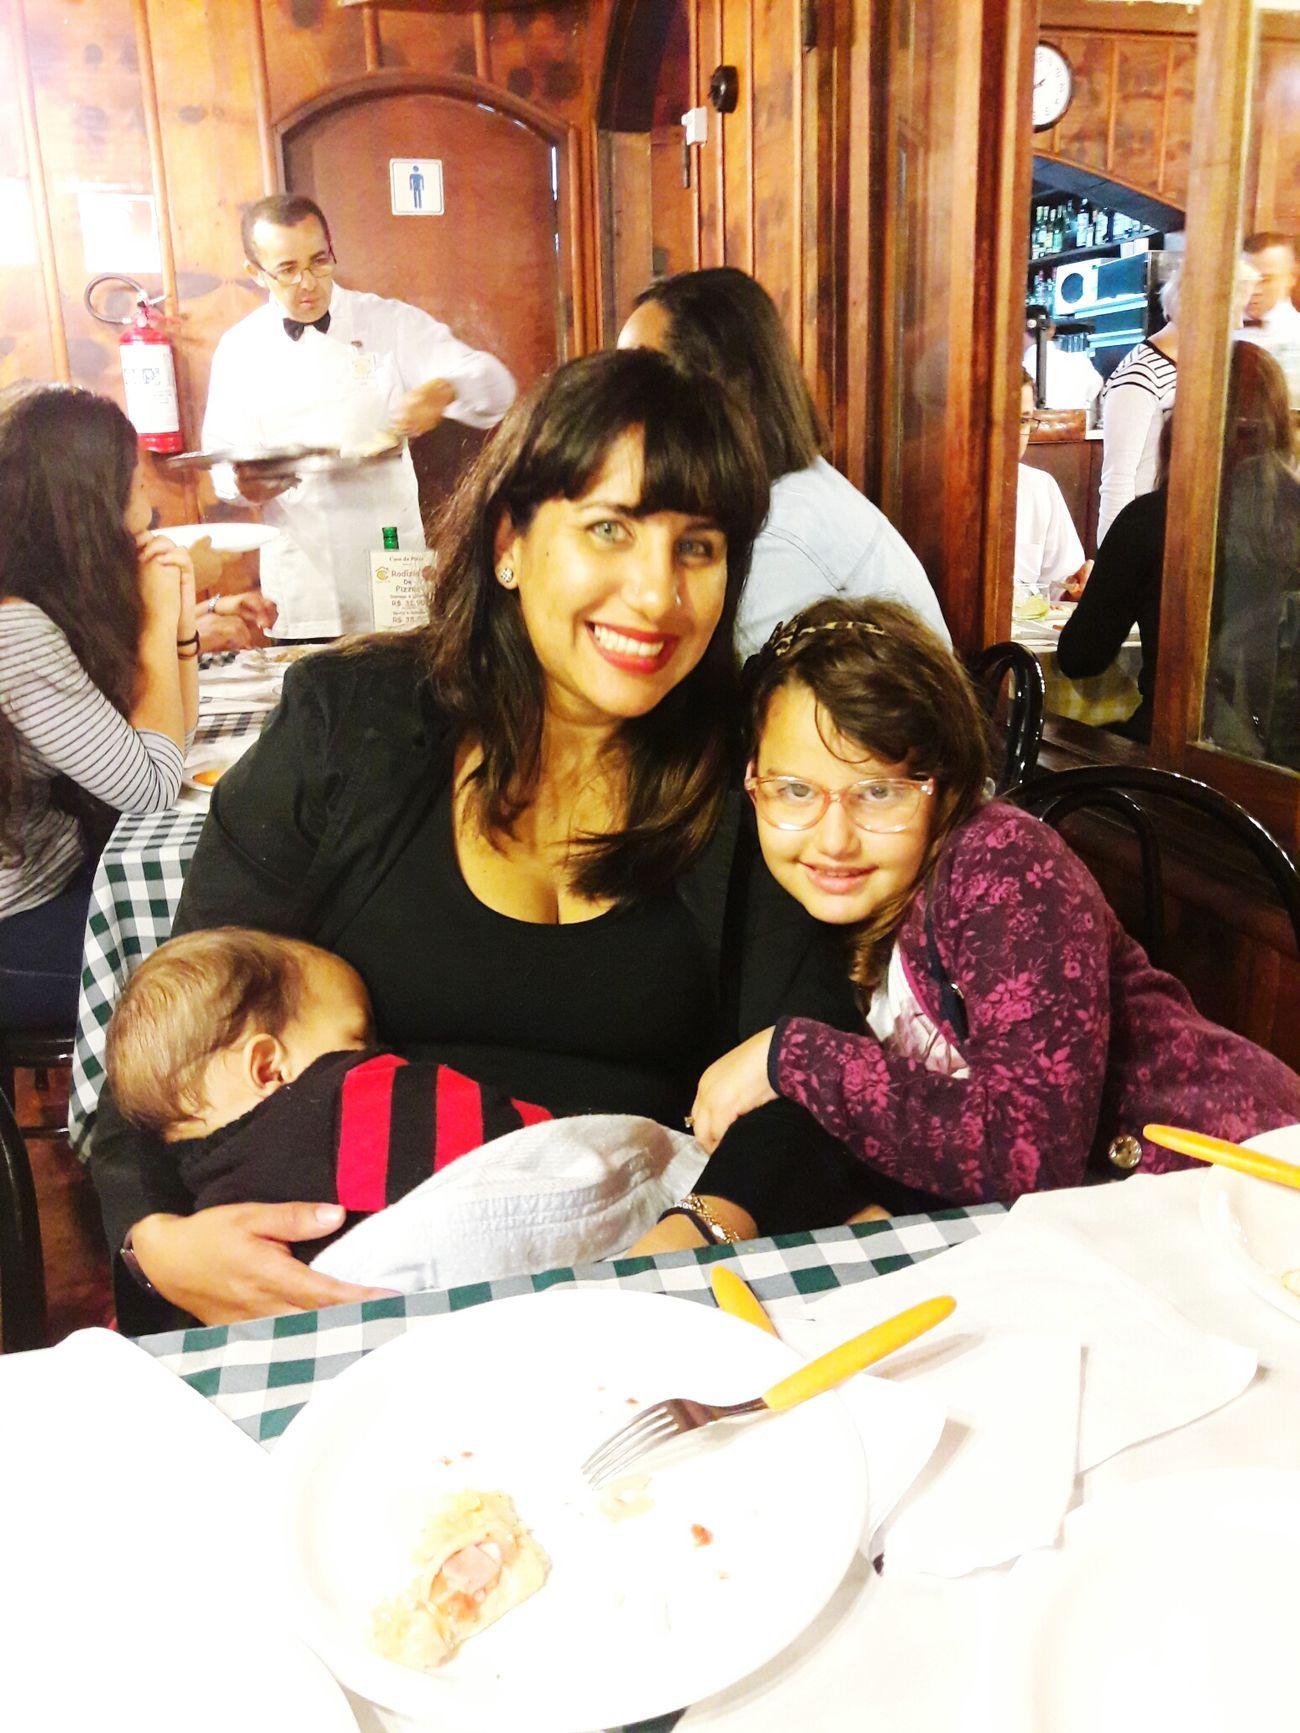 Family Happiness Filha ♥ My Princess <3 Mon Amour , Ma Vie ❤ Miamor ♡ Family❤ Mybaby 👶 AMOUR DE MA VIE My Baby Boy ❤ Brazil Mon Amour De Bébé